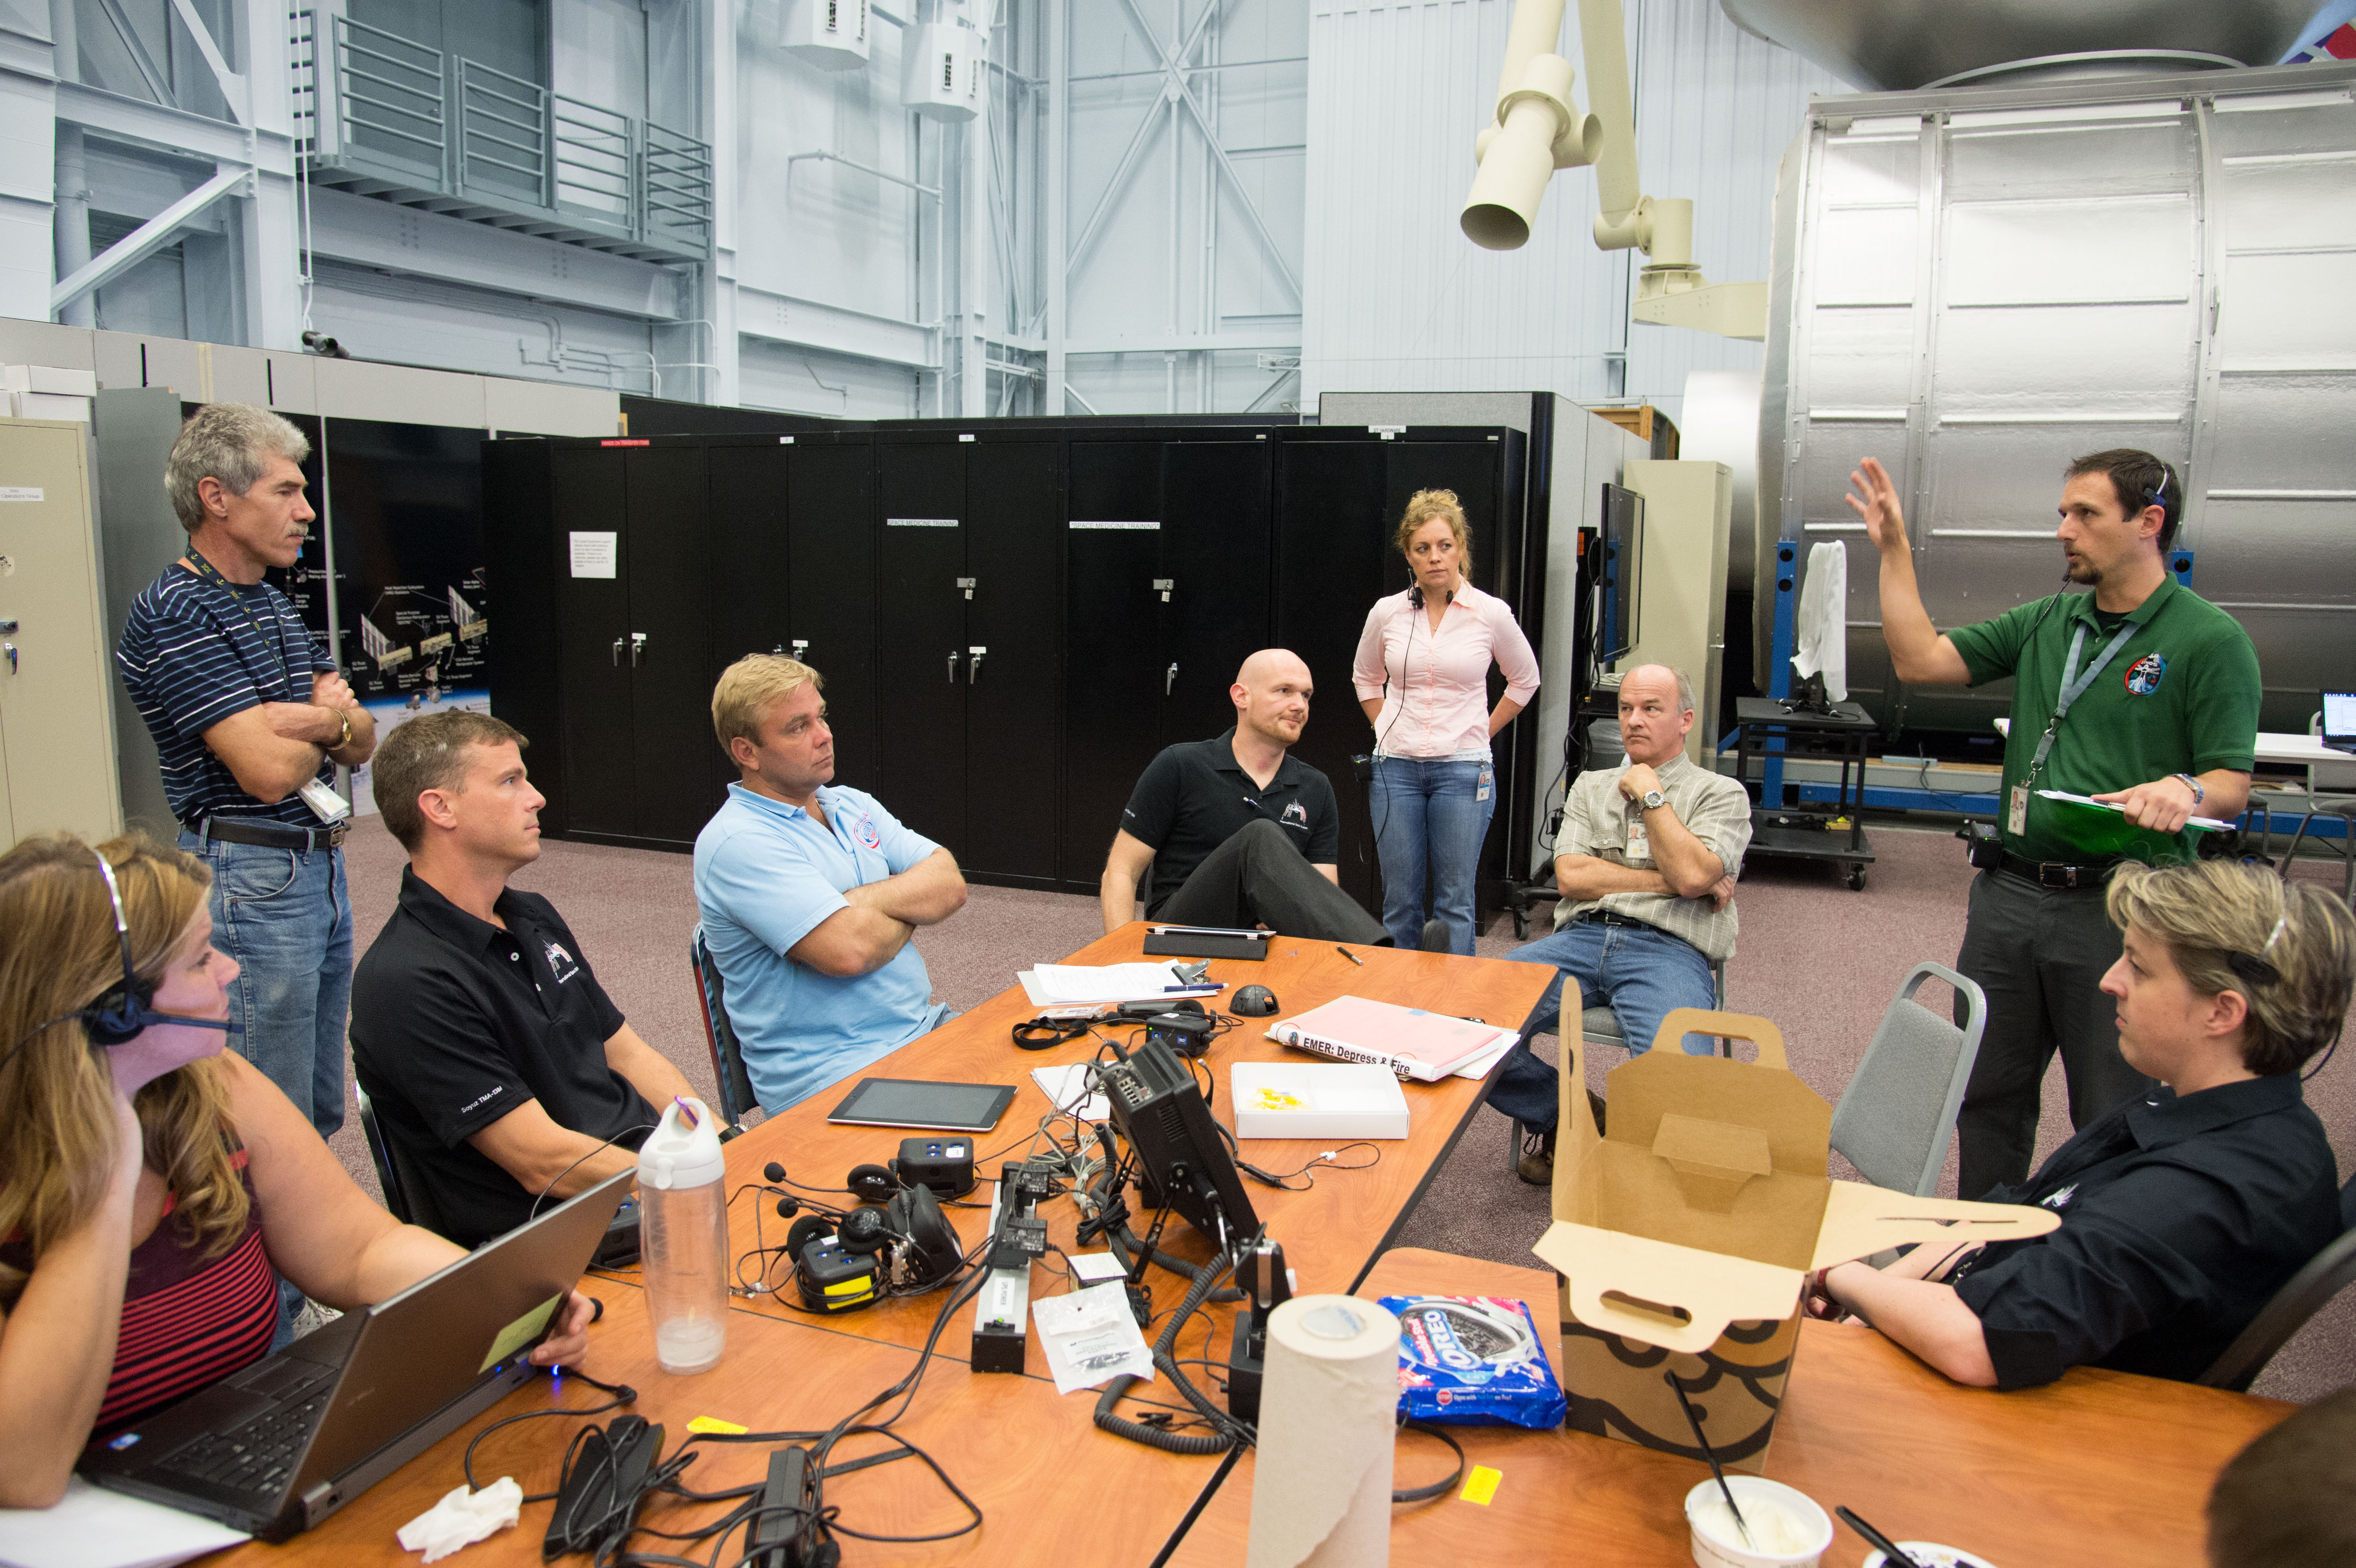 nasa crew training texas - photo #39